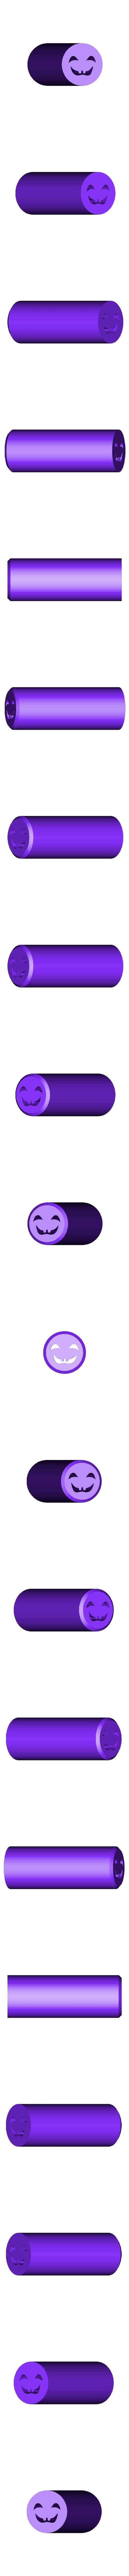 Filtro  halloween face6 v1.stl Download STL file FILTER TIPS - 89 FILTERS- ALL PACKS - WEED FILTER • 3D printer model, Weed420House